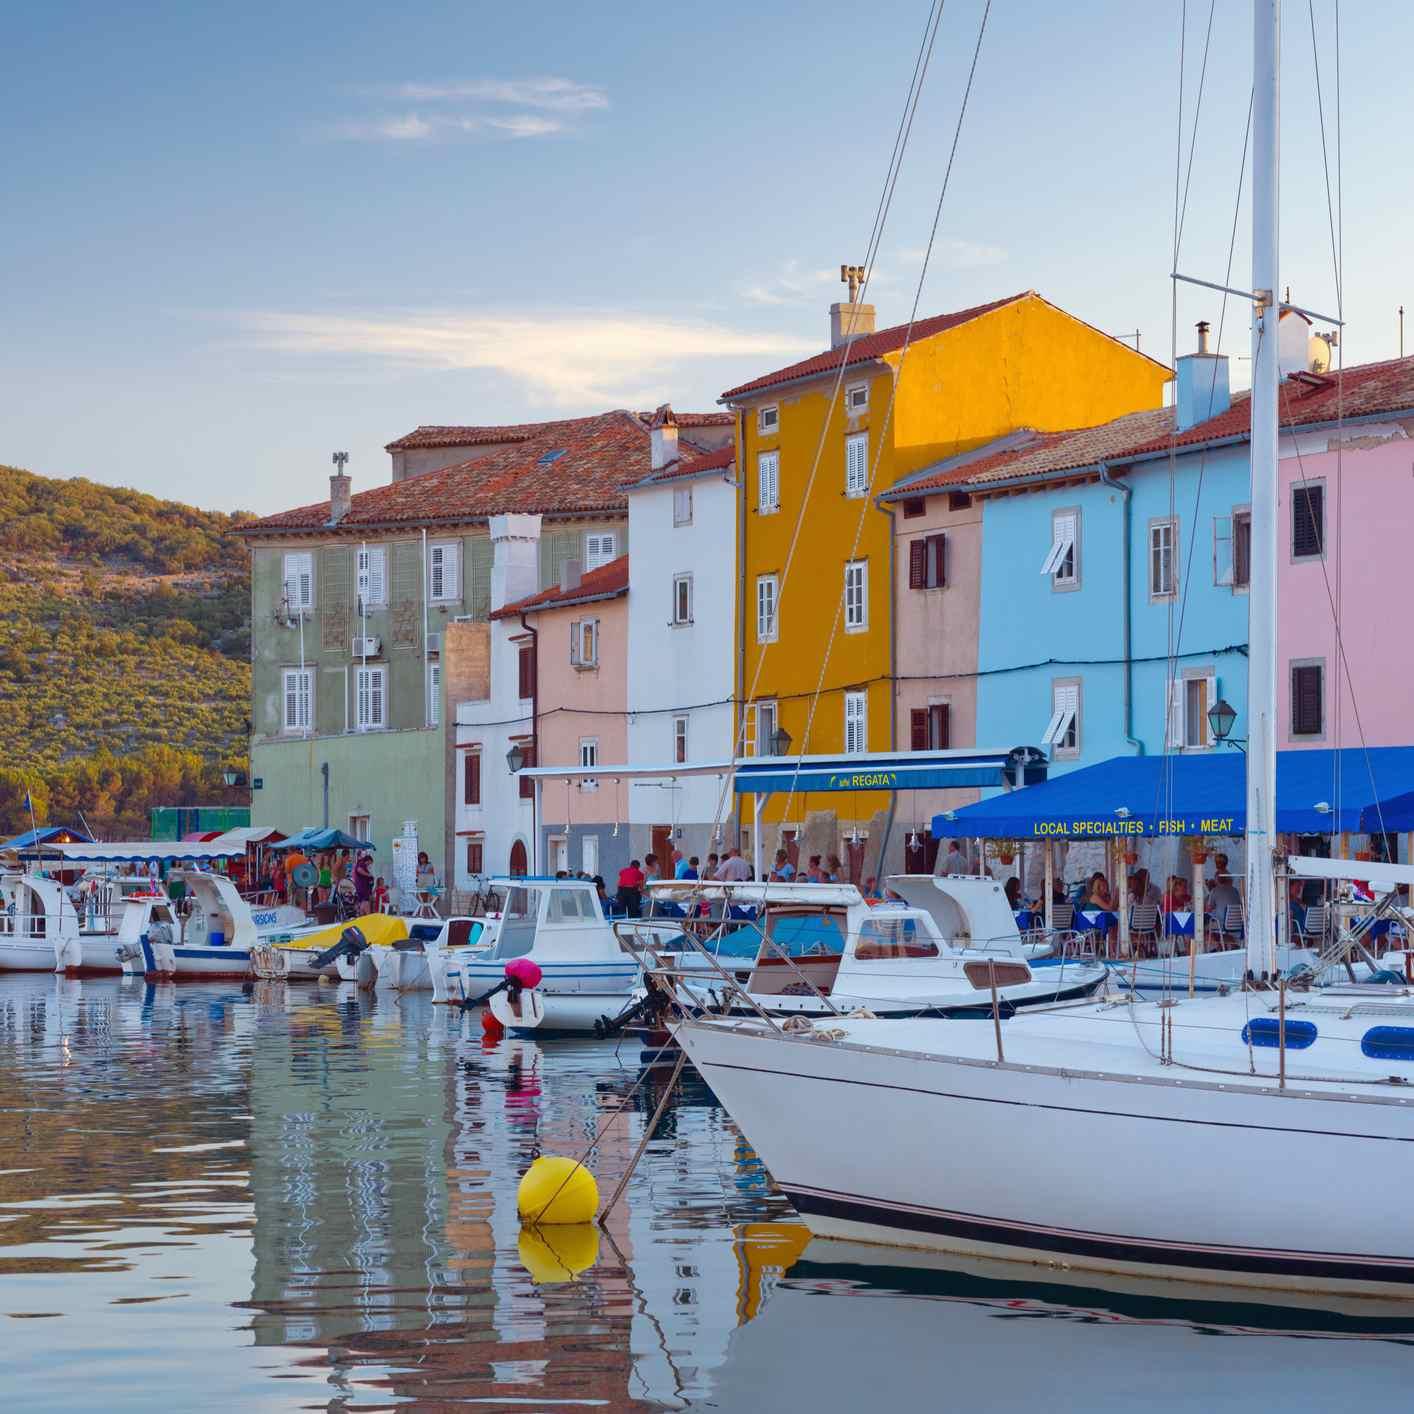 Croatia, Cres Island, Cres Town